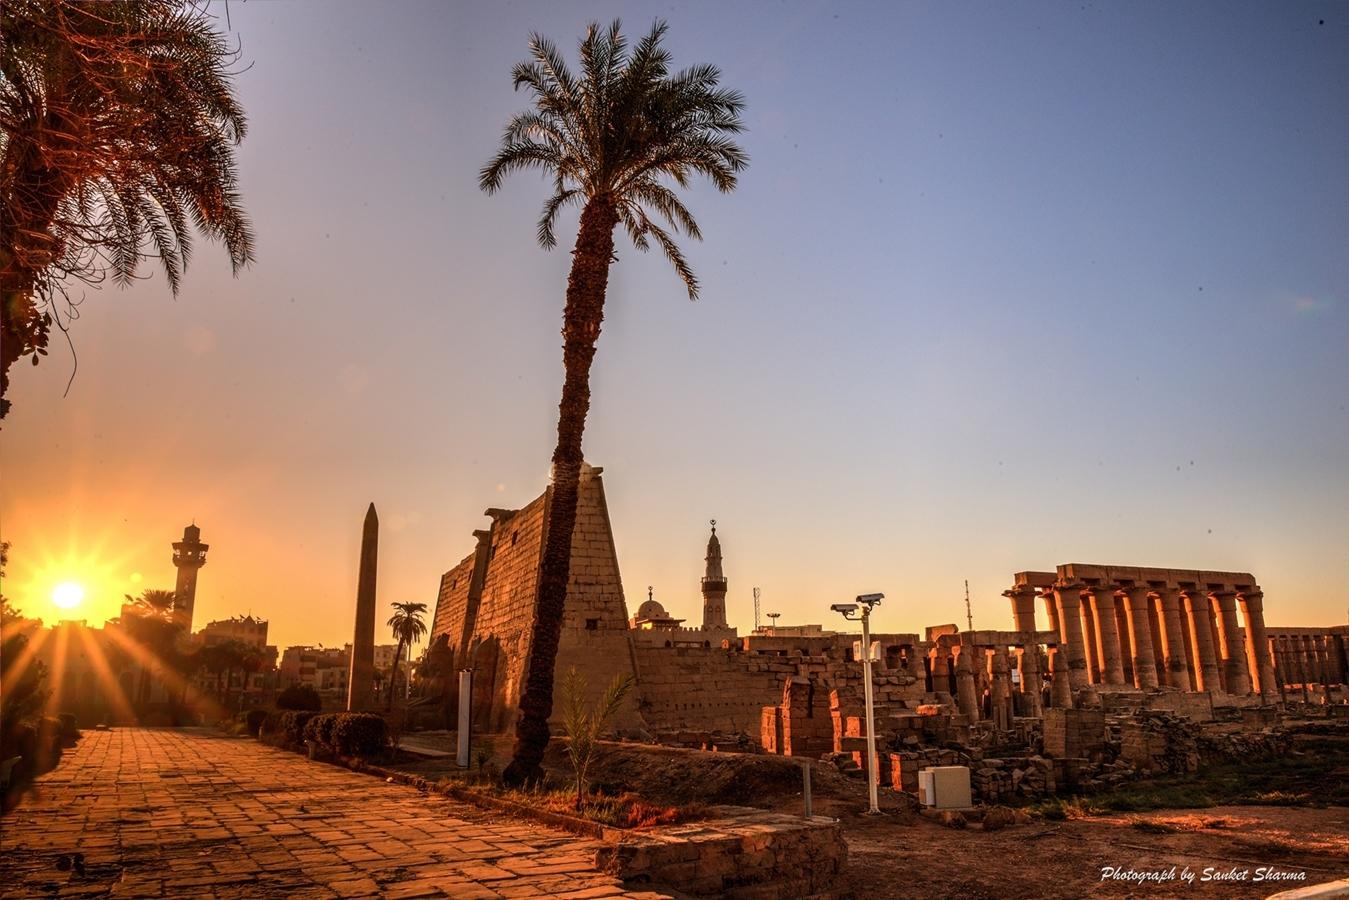 Sunrise at Luxor Temple, Egypt